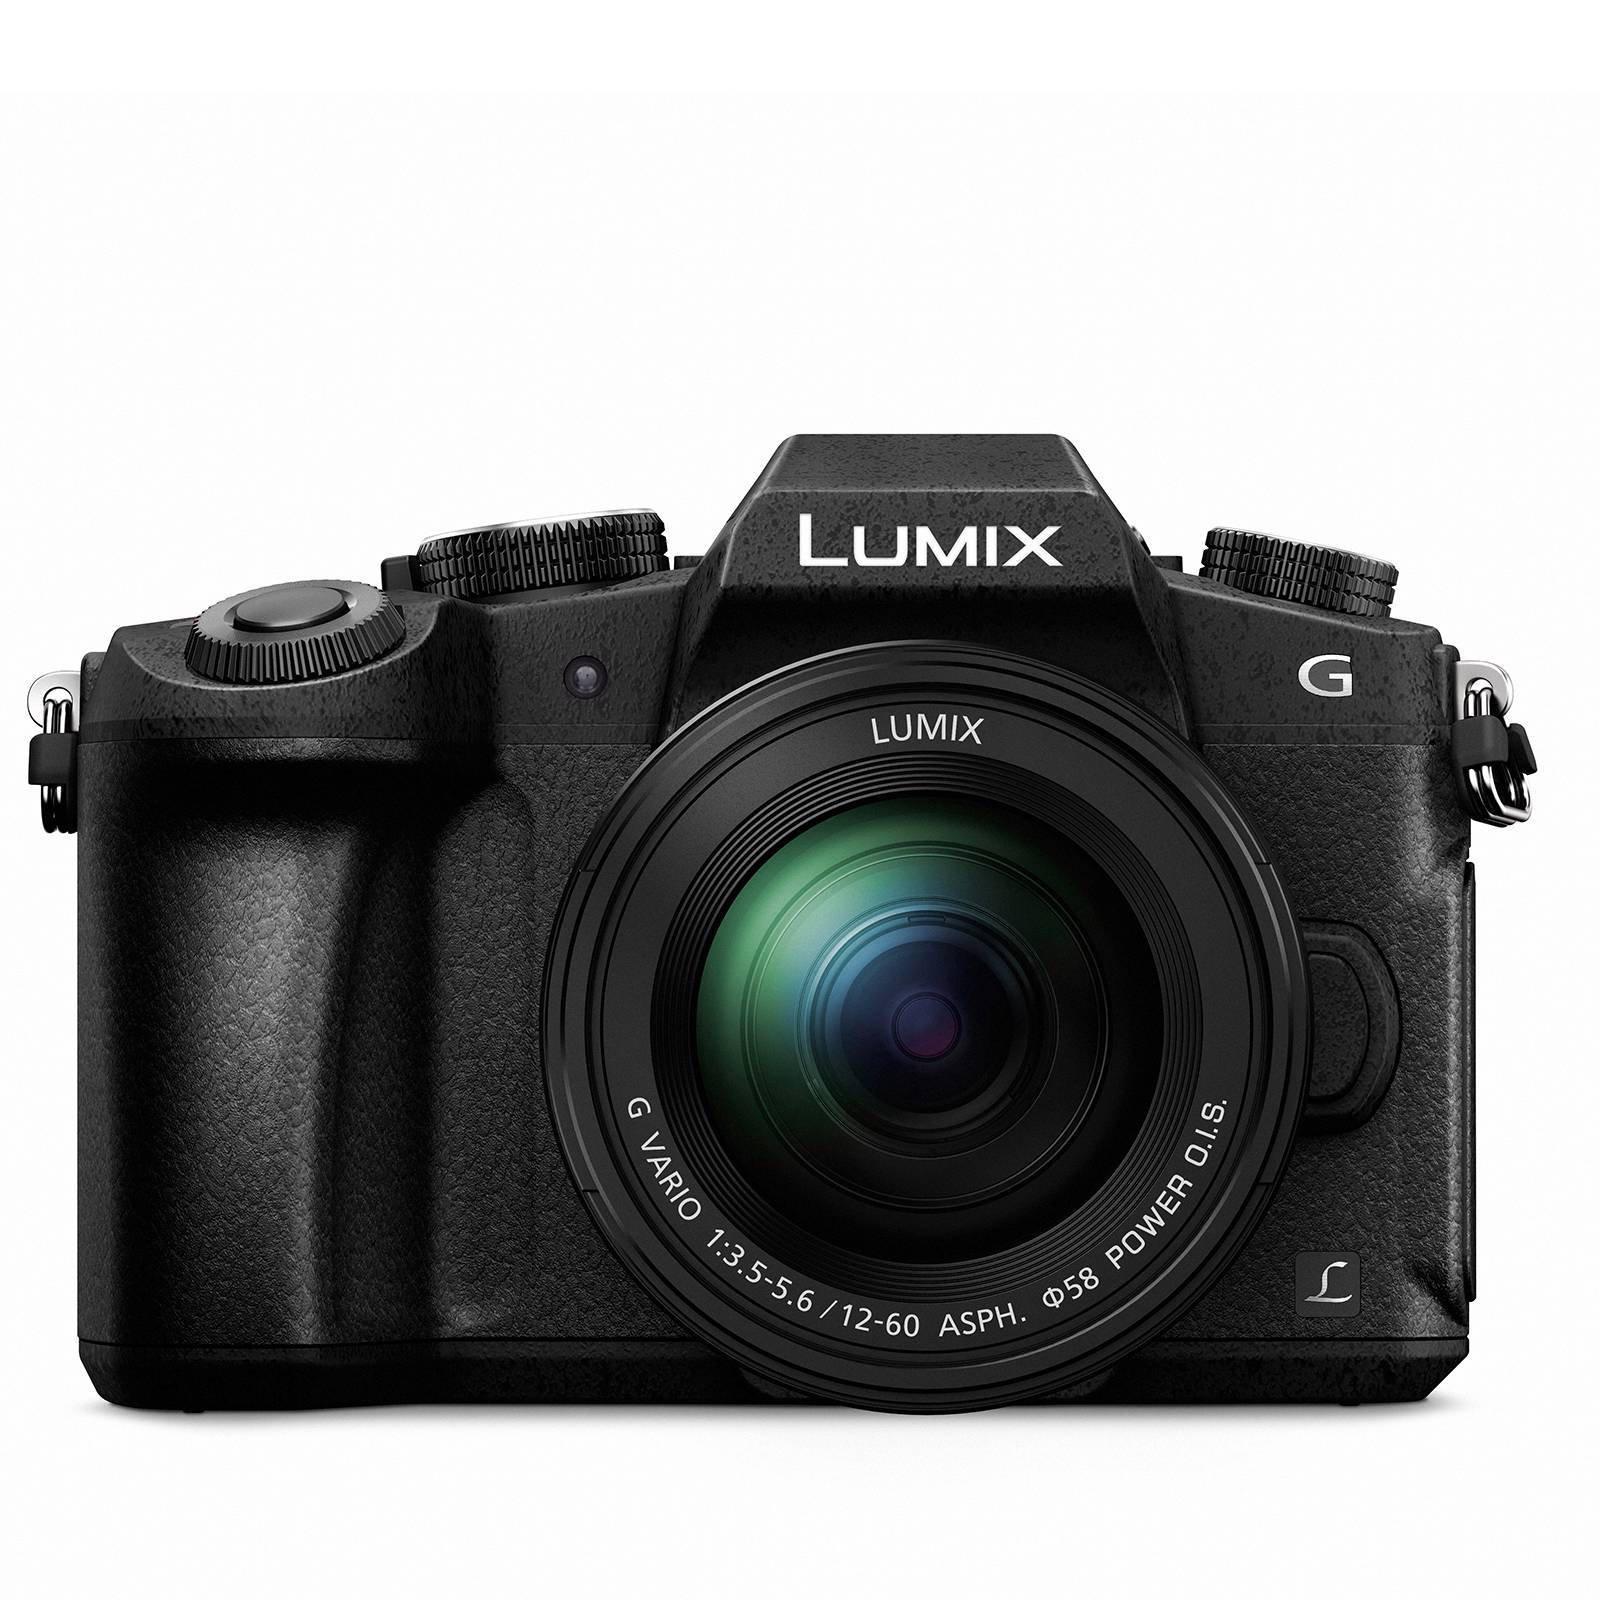 Panasonic DMC-G80 Lumix G + 12-60mm systeem camera